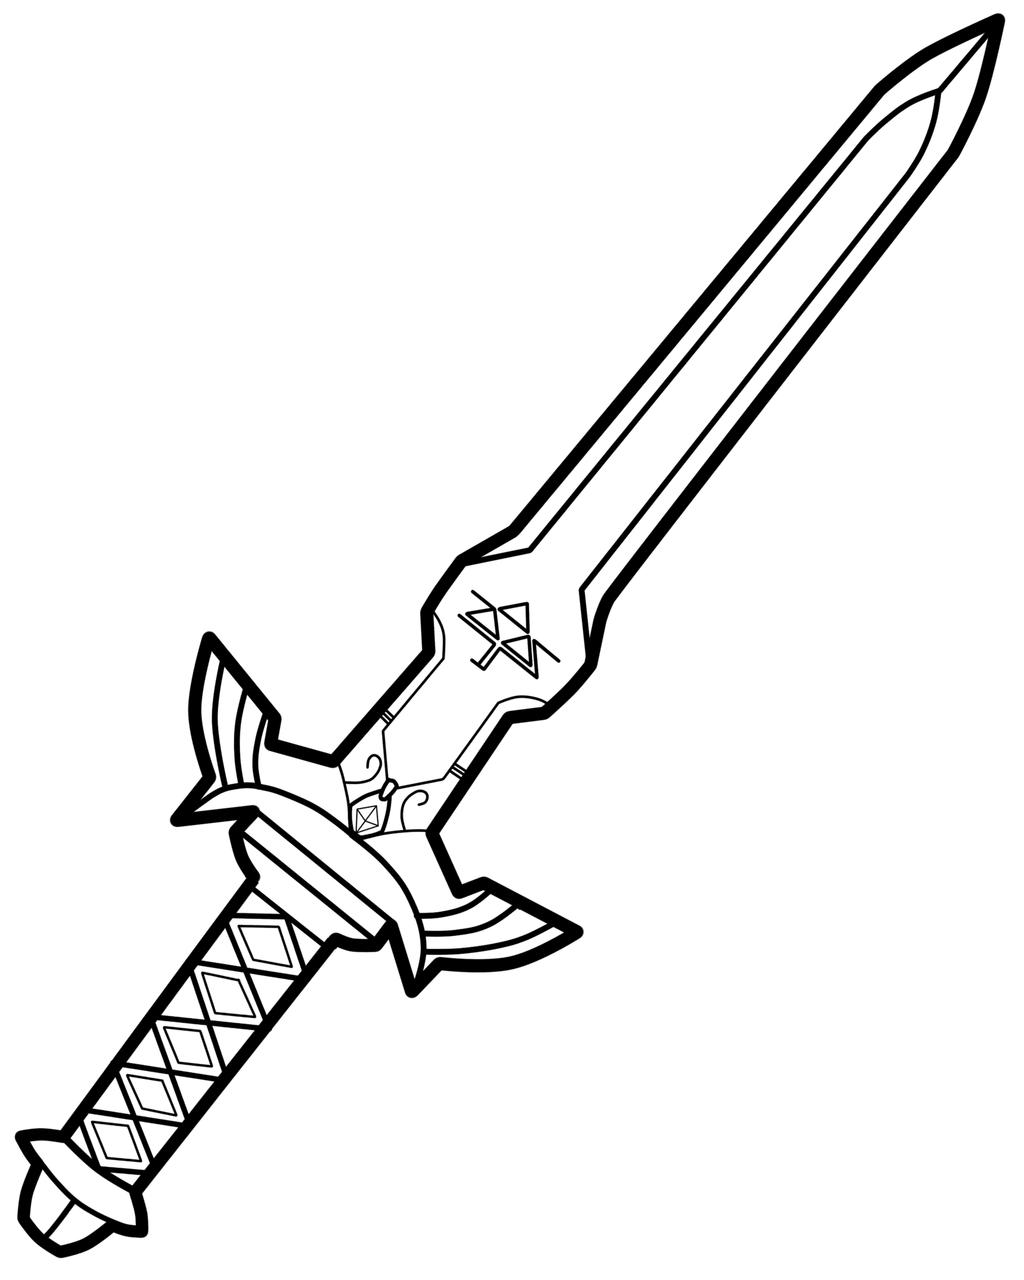 1024x1280 Black Katana Sword Wallpaper, Pc Black Katana Sword Wallpaper Most